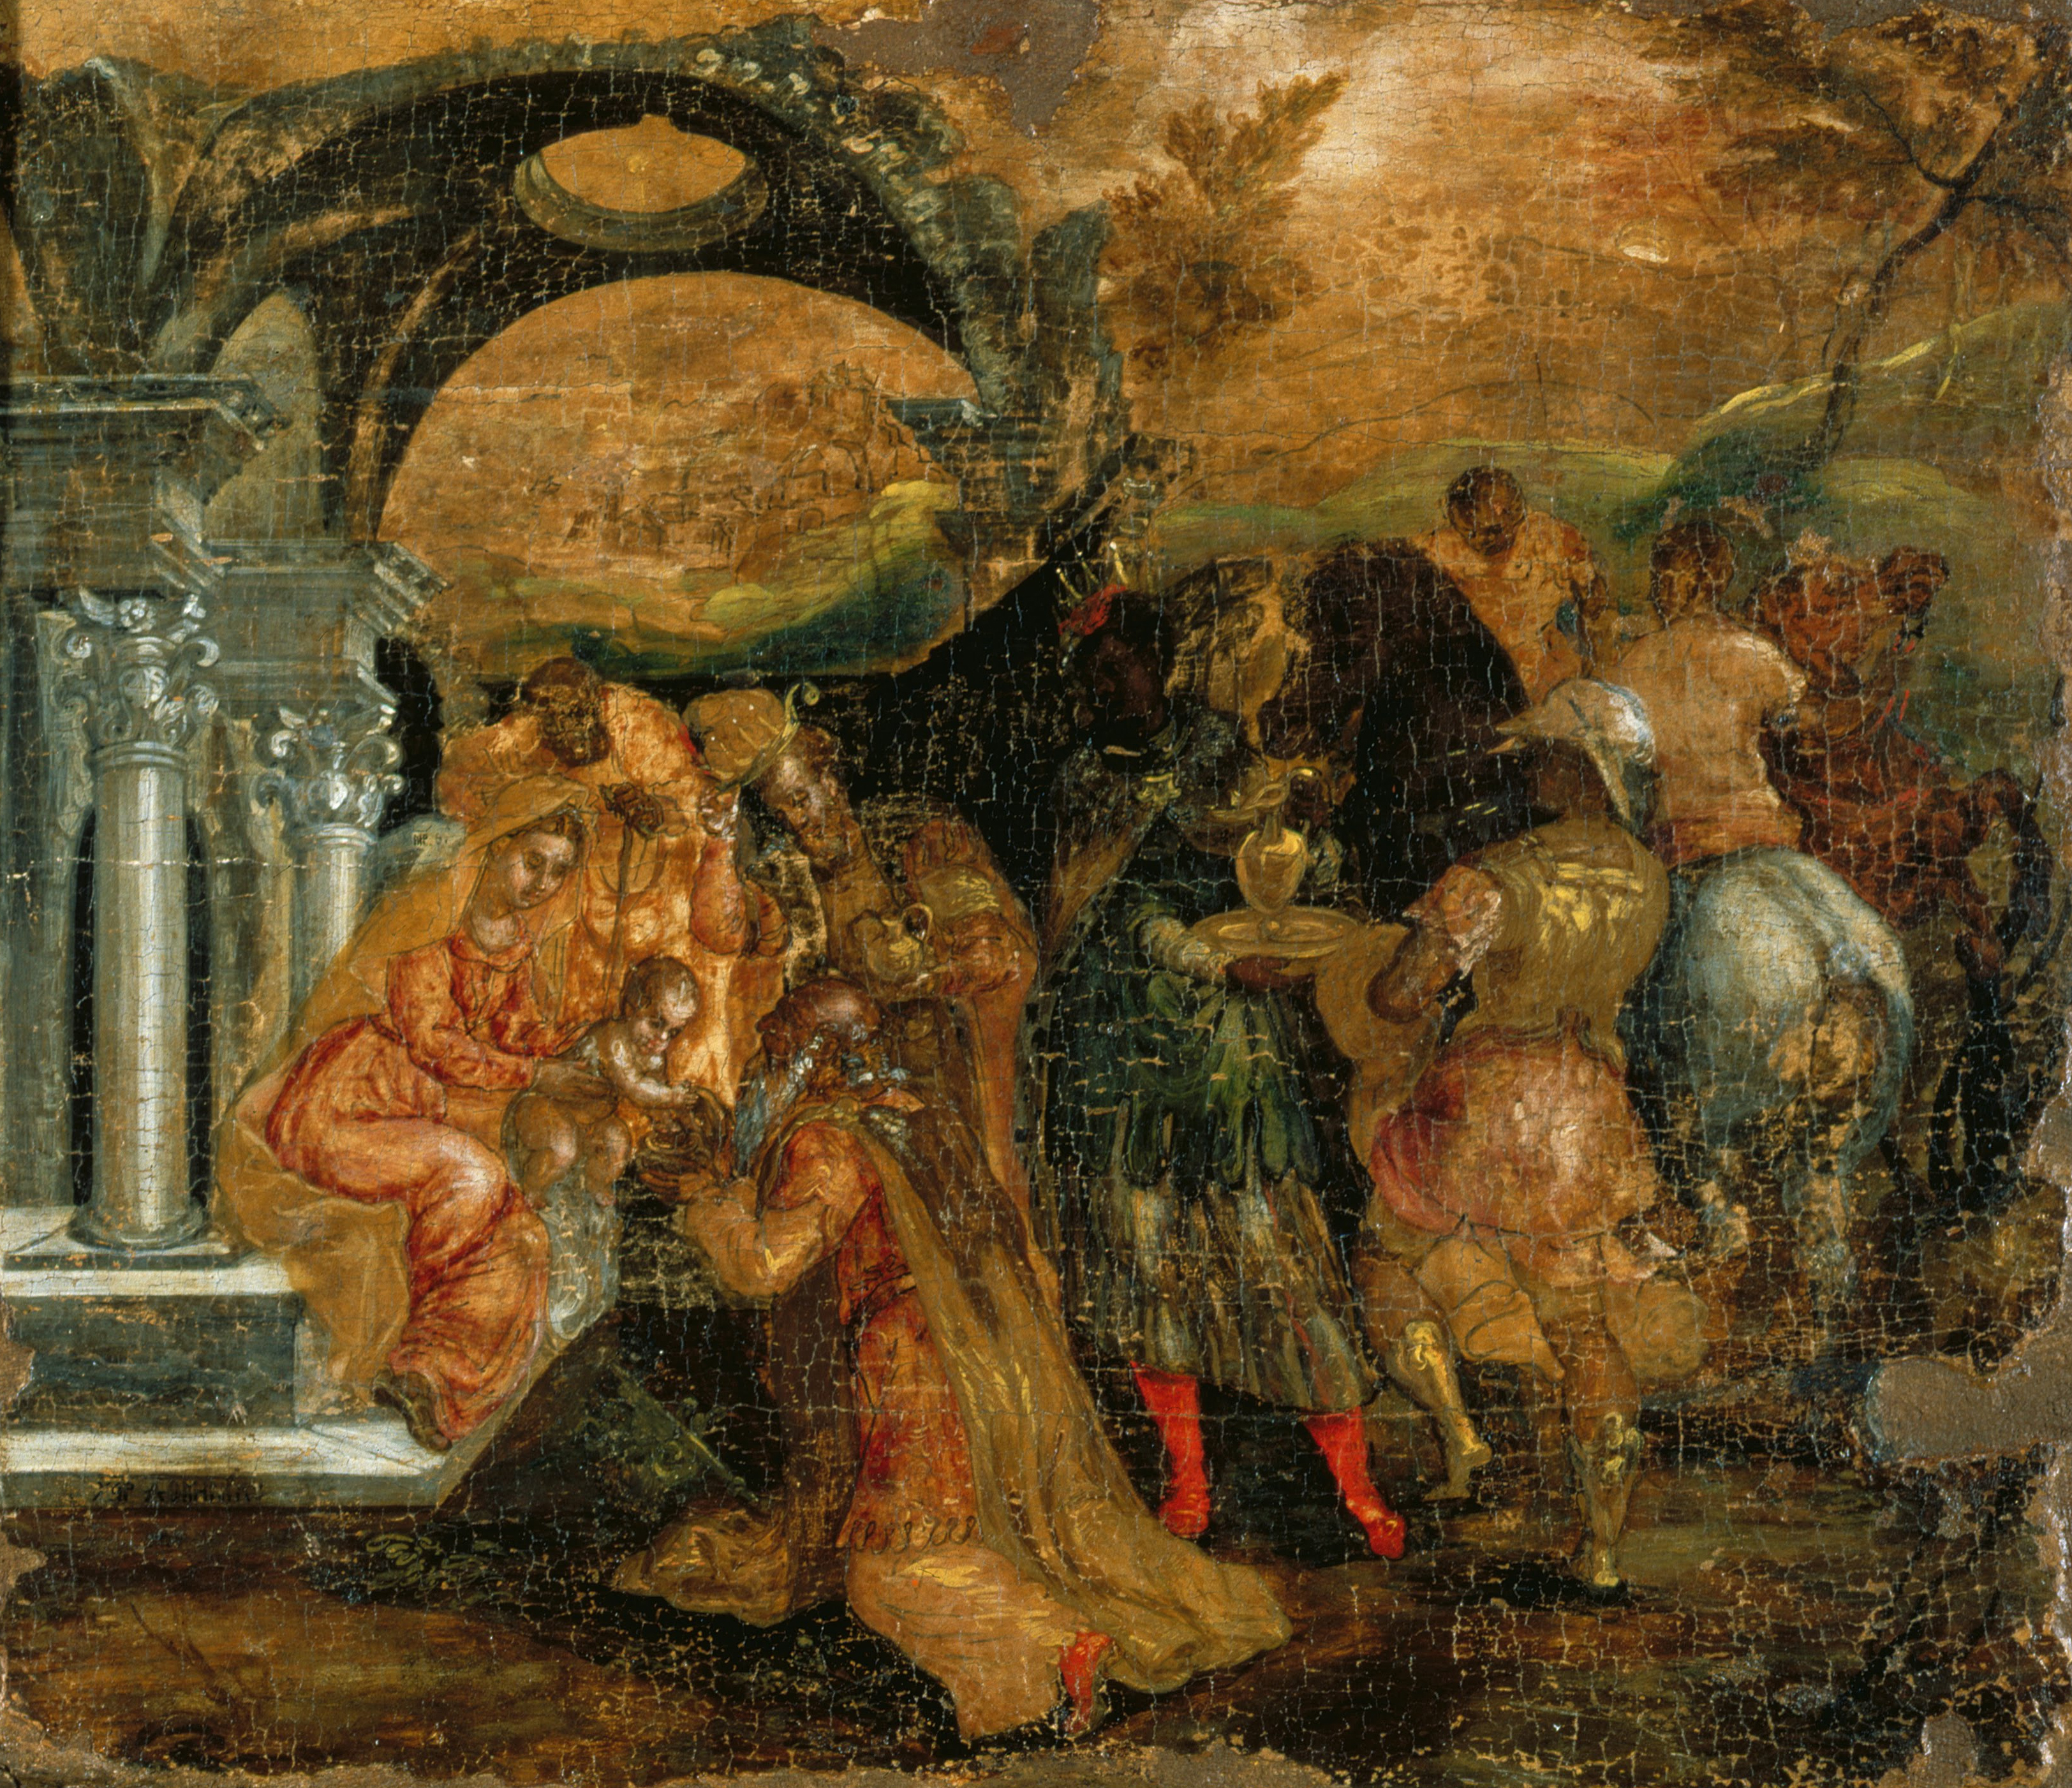 fileel greco the adoration of the magi google art